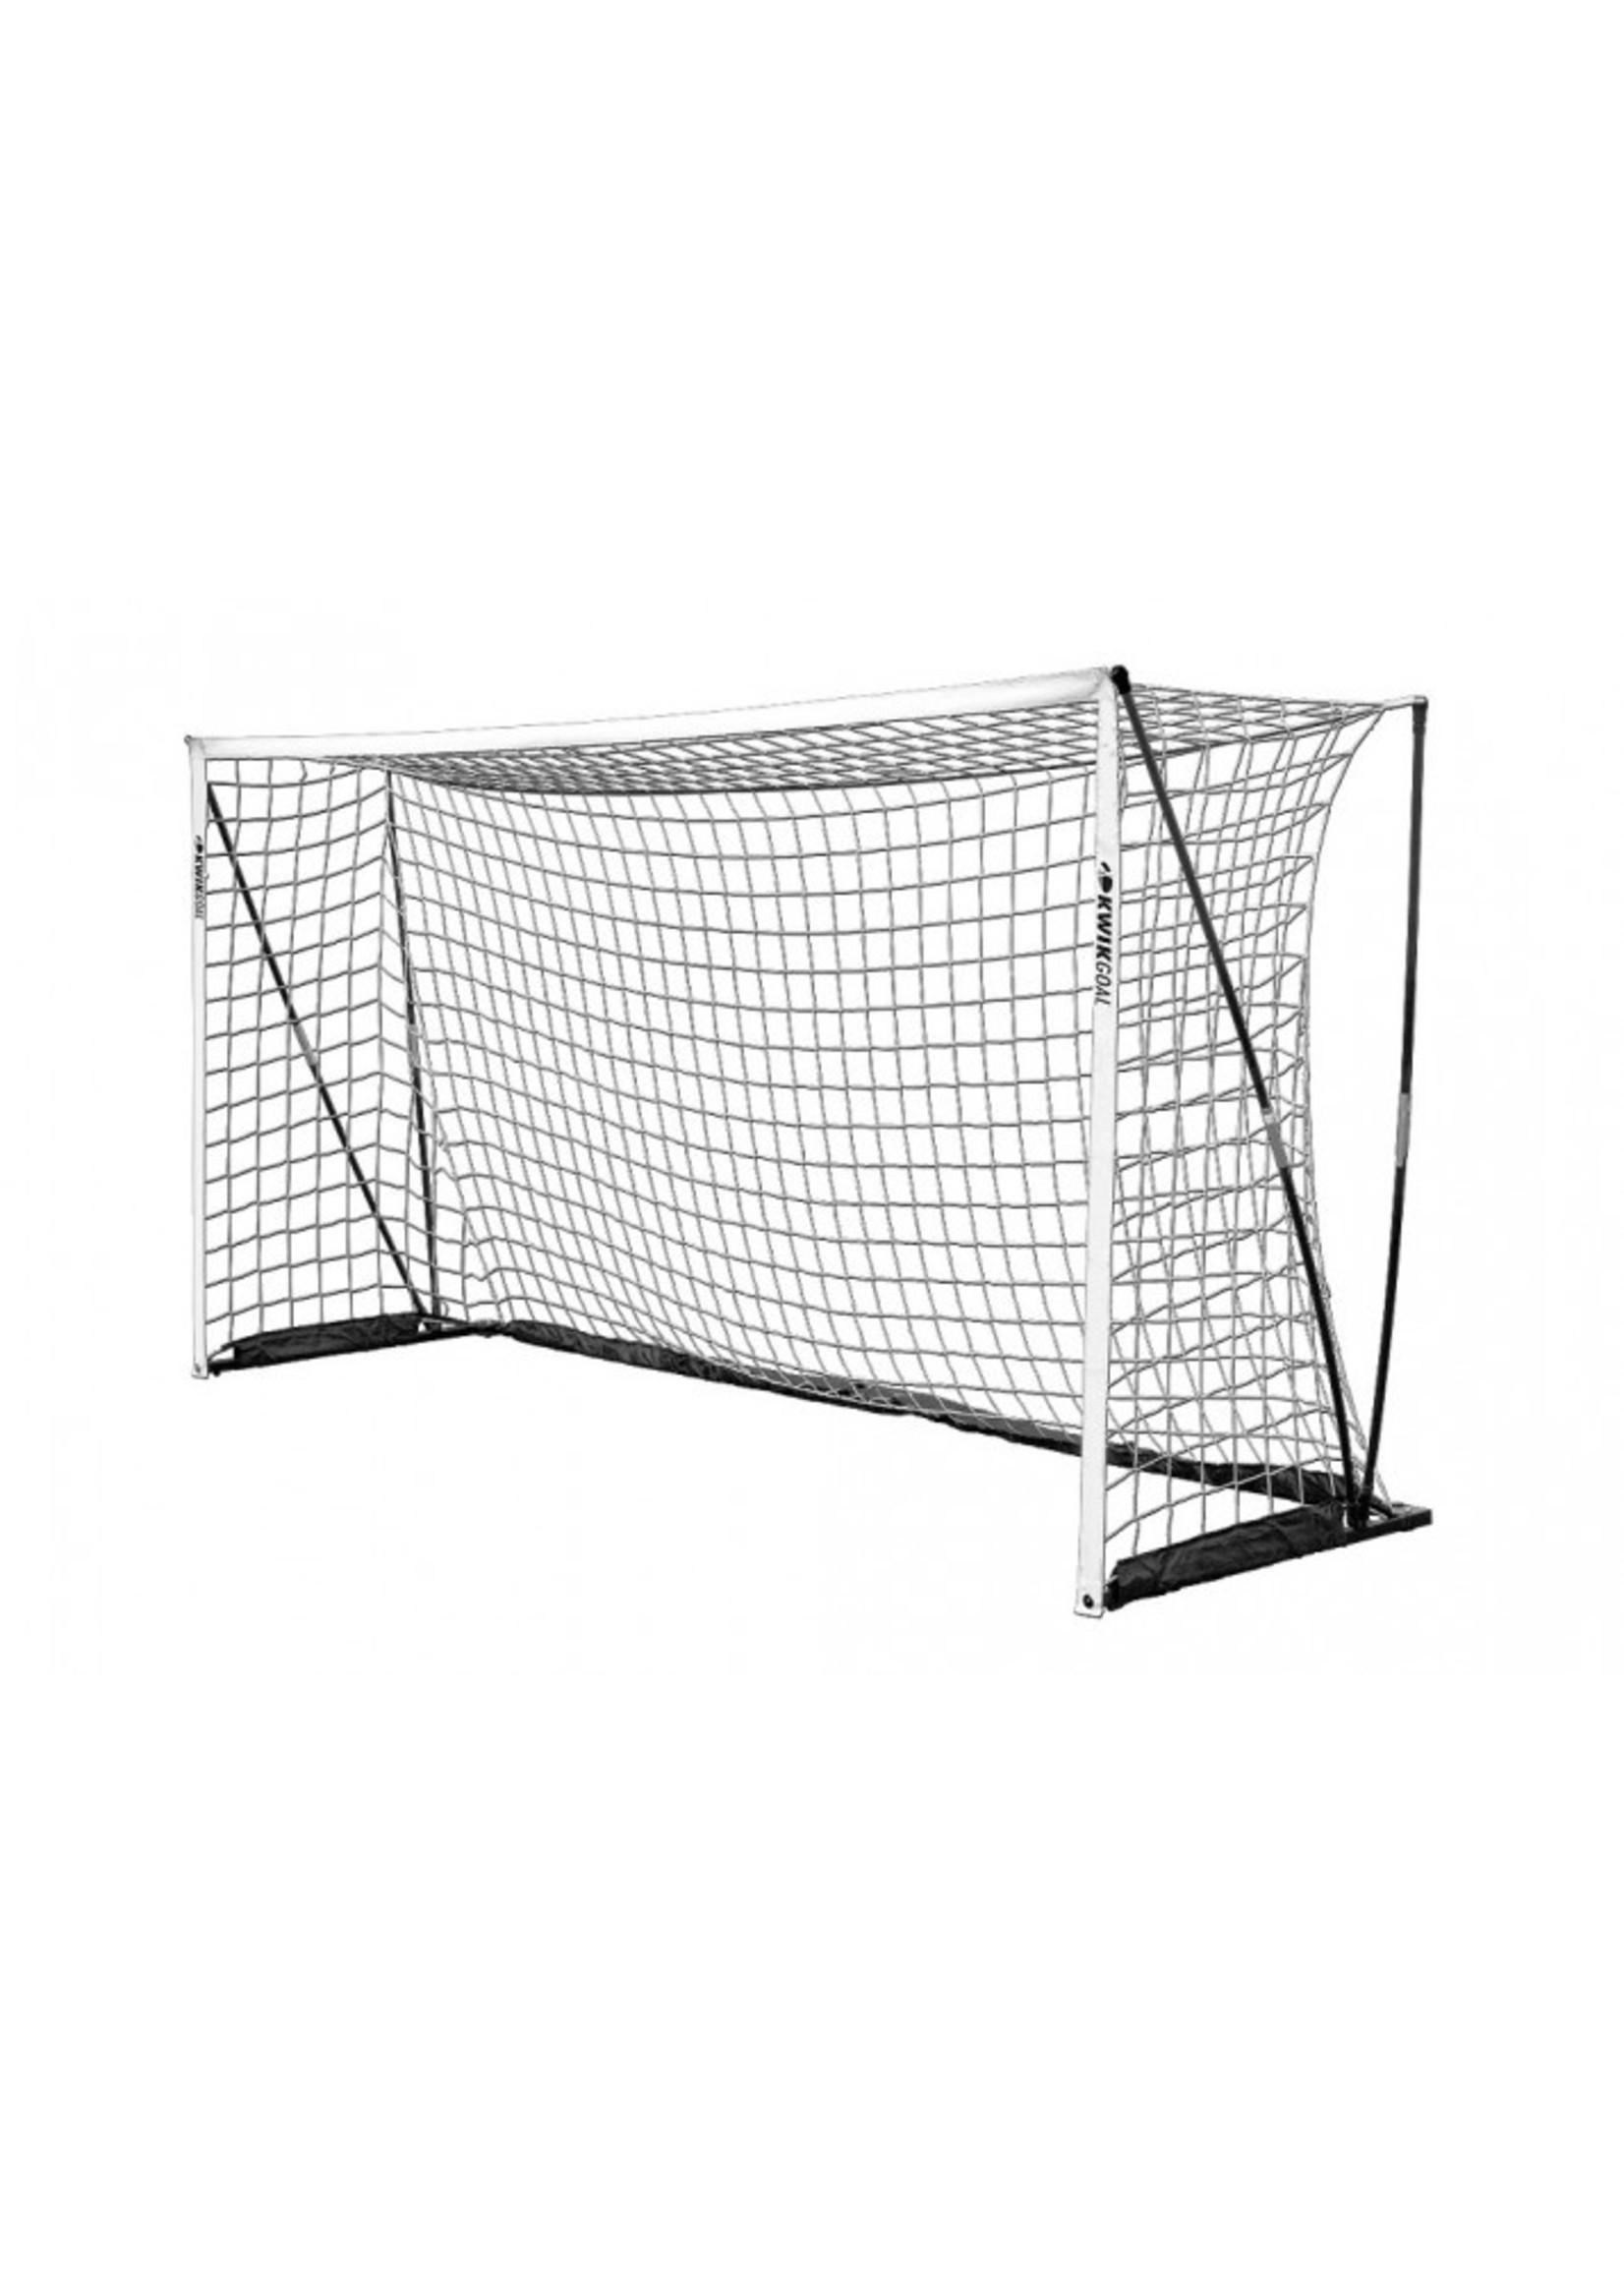 Kwik Flex Goal 6.5x12